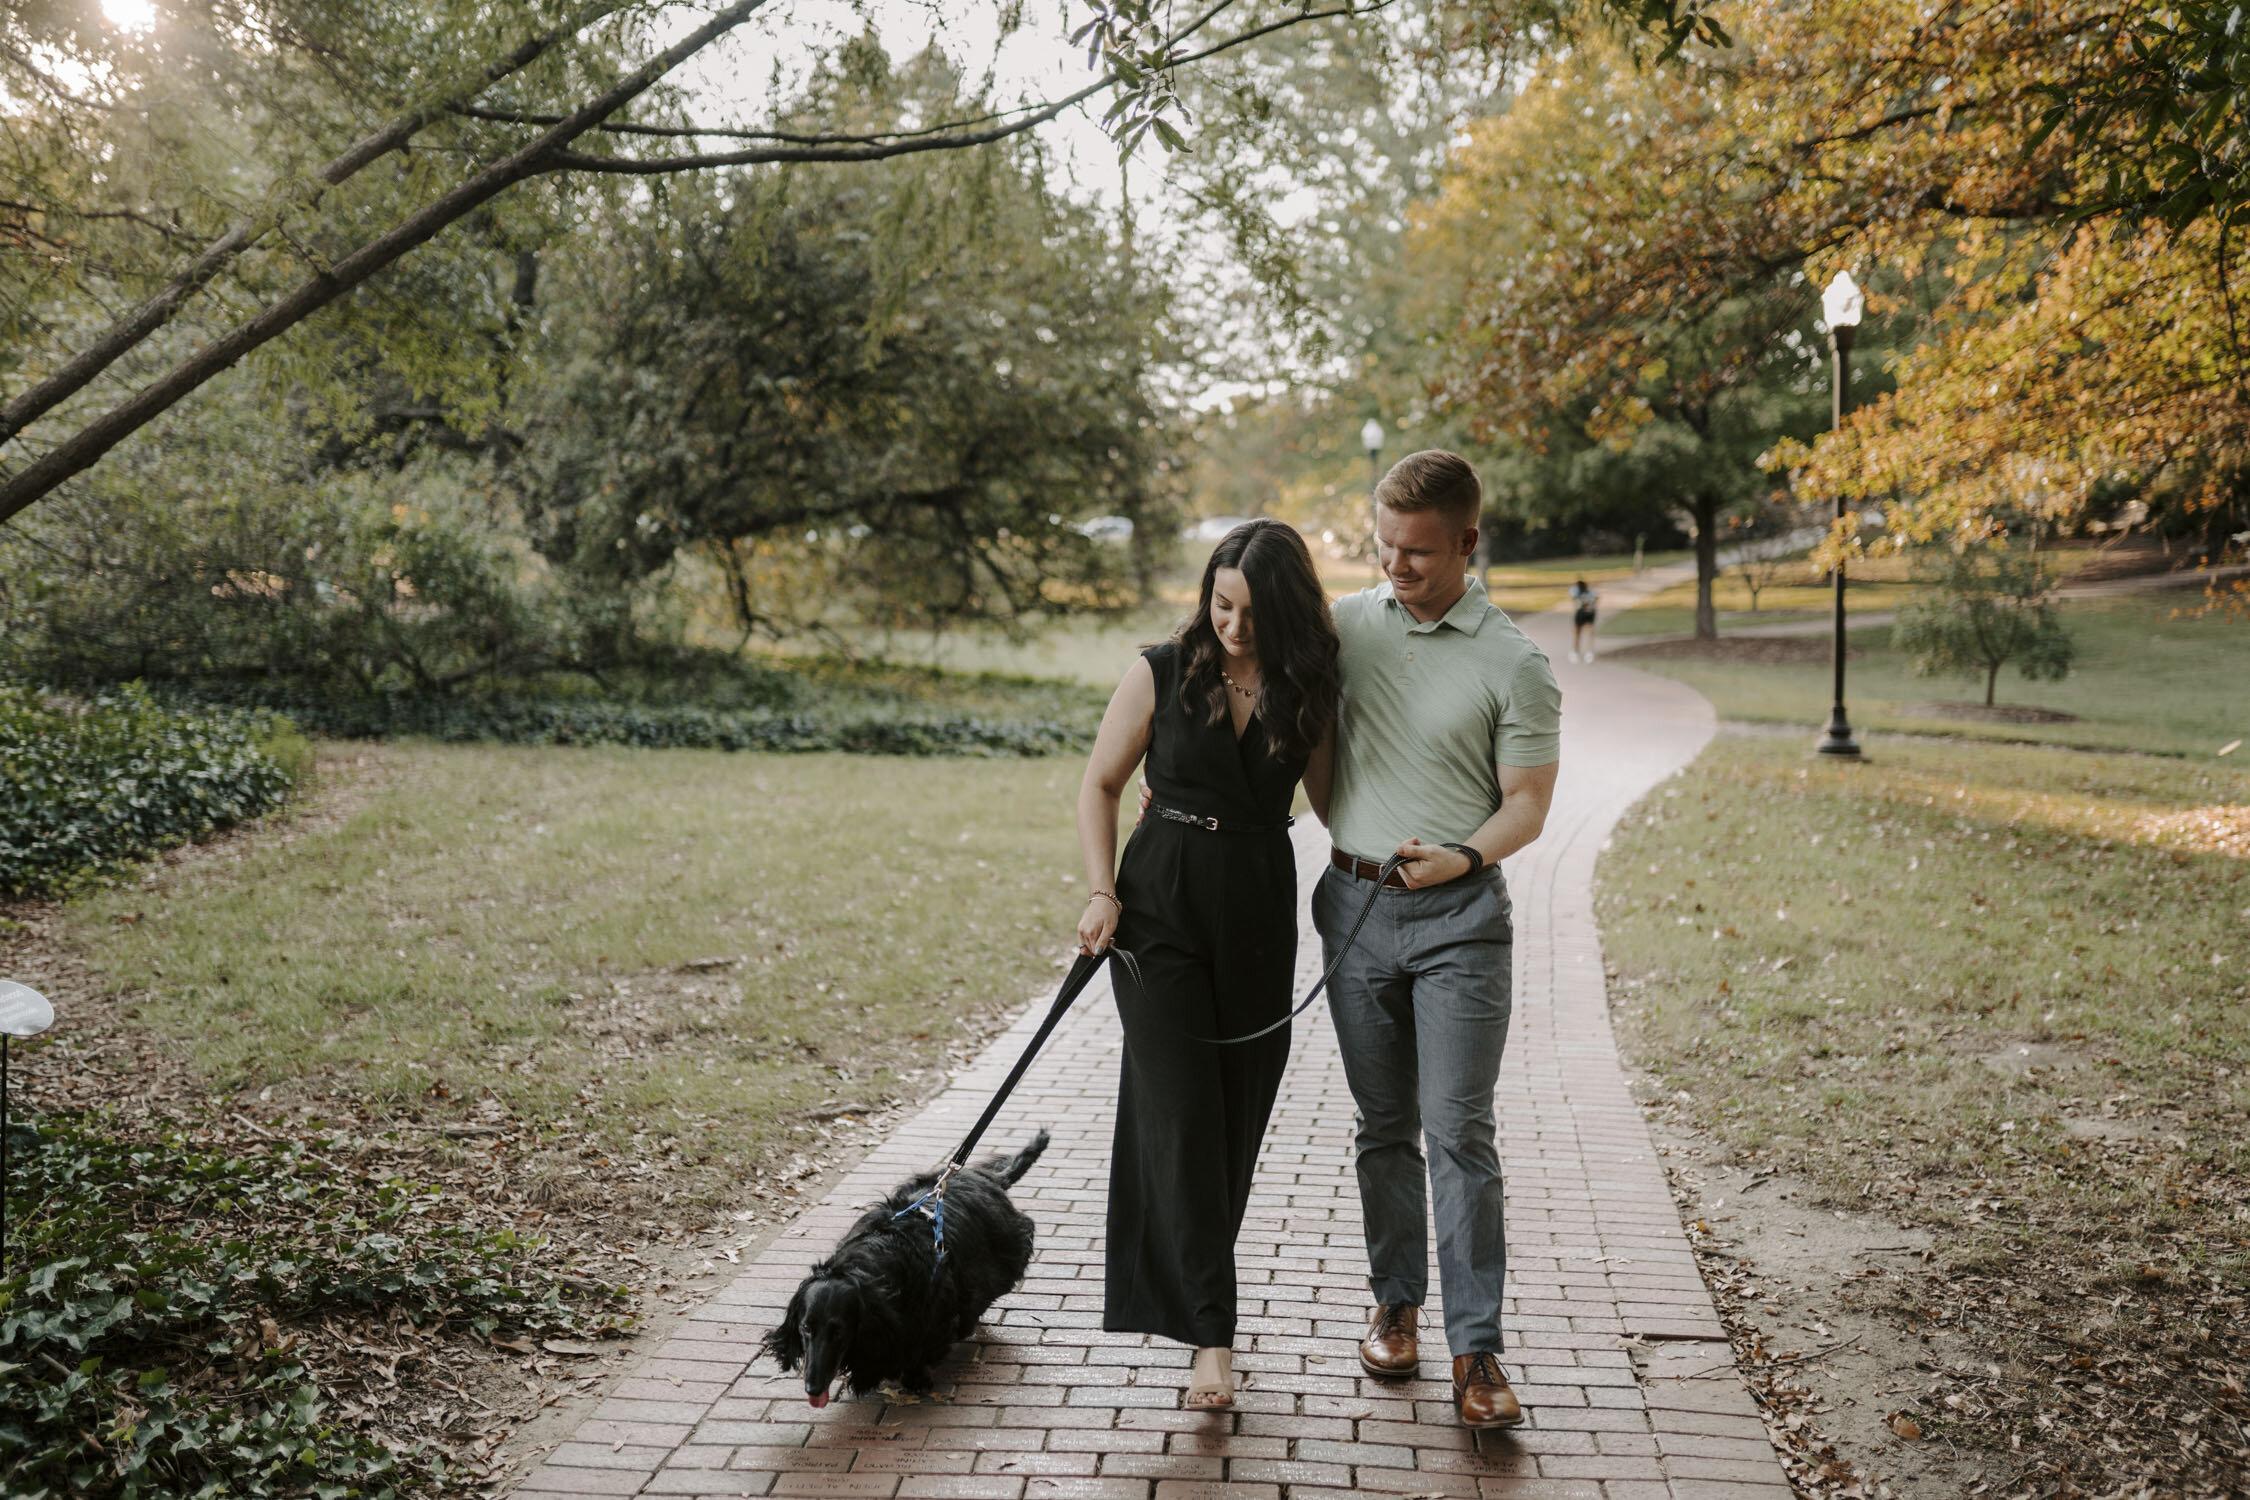 UNCG Engagement Session by Kayli LaFon Photography | Greensboro Winston-Salem, NC Wedding & Elopement Photographer